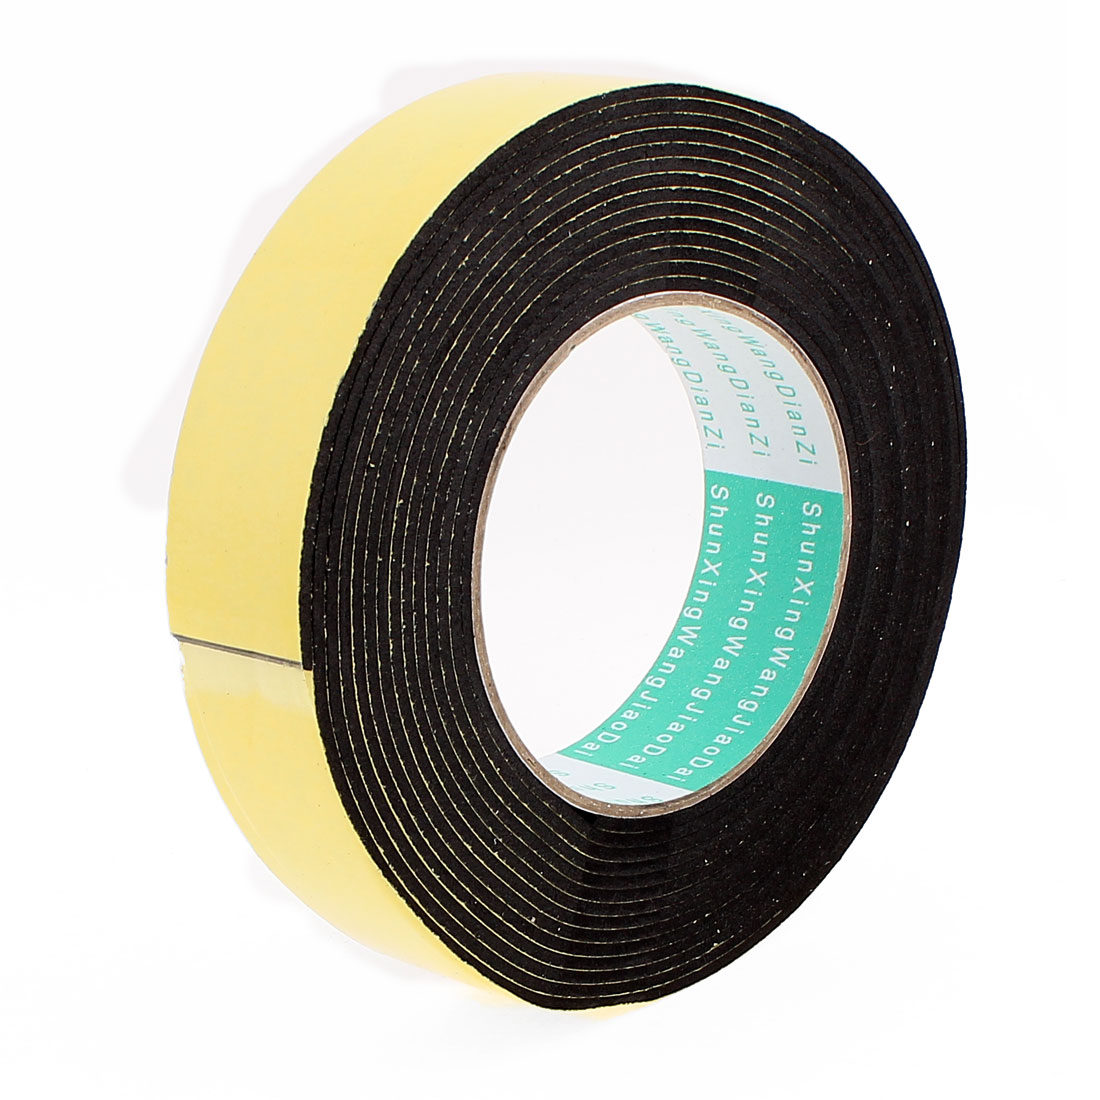 5 Meters 30mm x 2mm Single Side Adhesive EVA Foam Sealing Tap